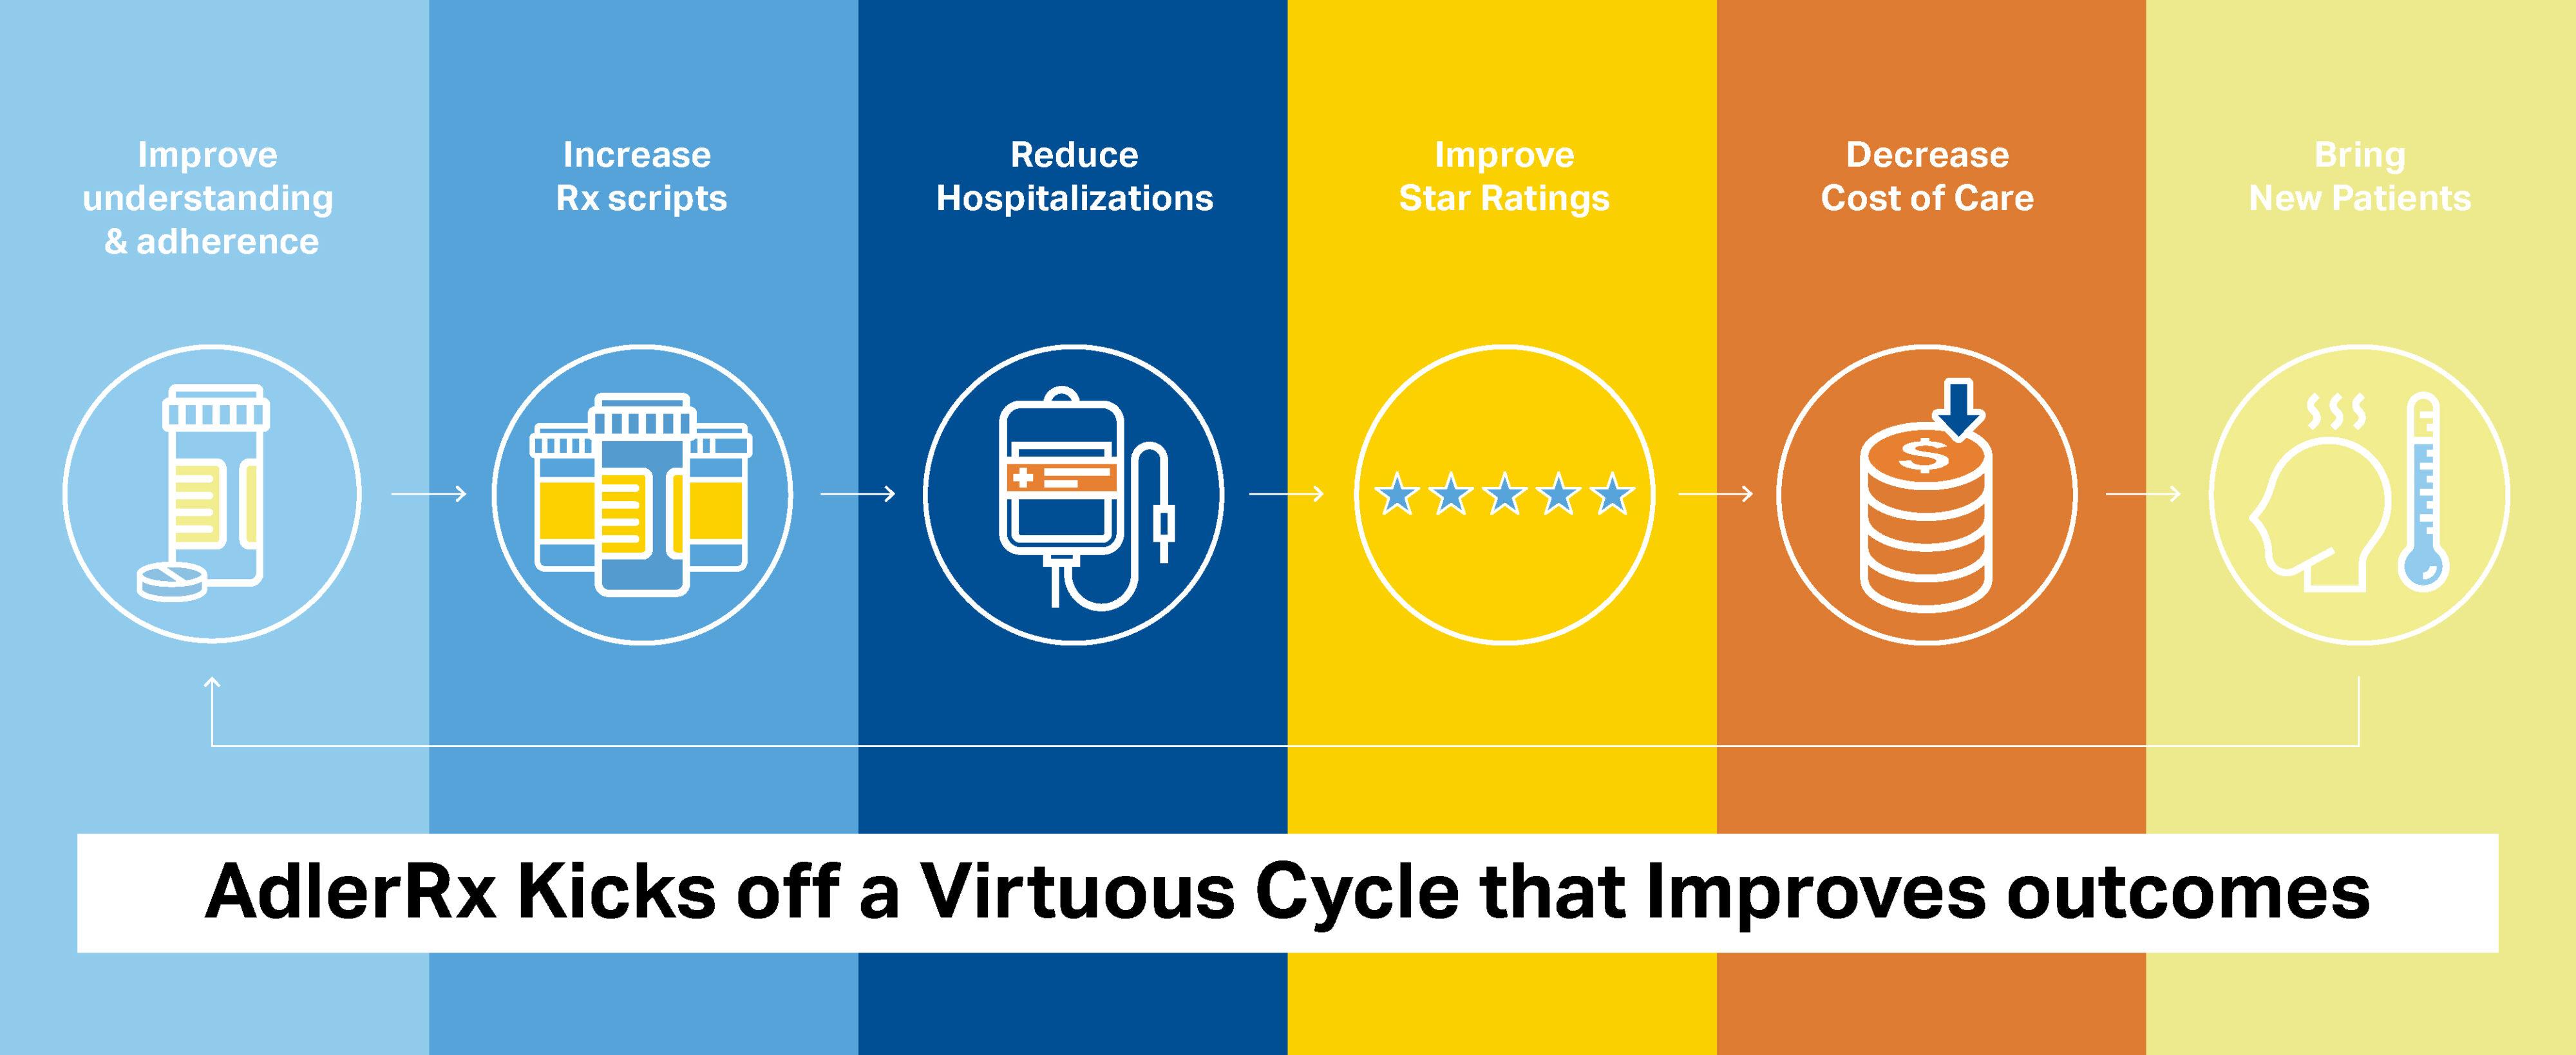 AdlerRx Virtuous cycle